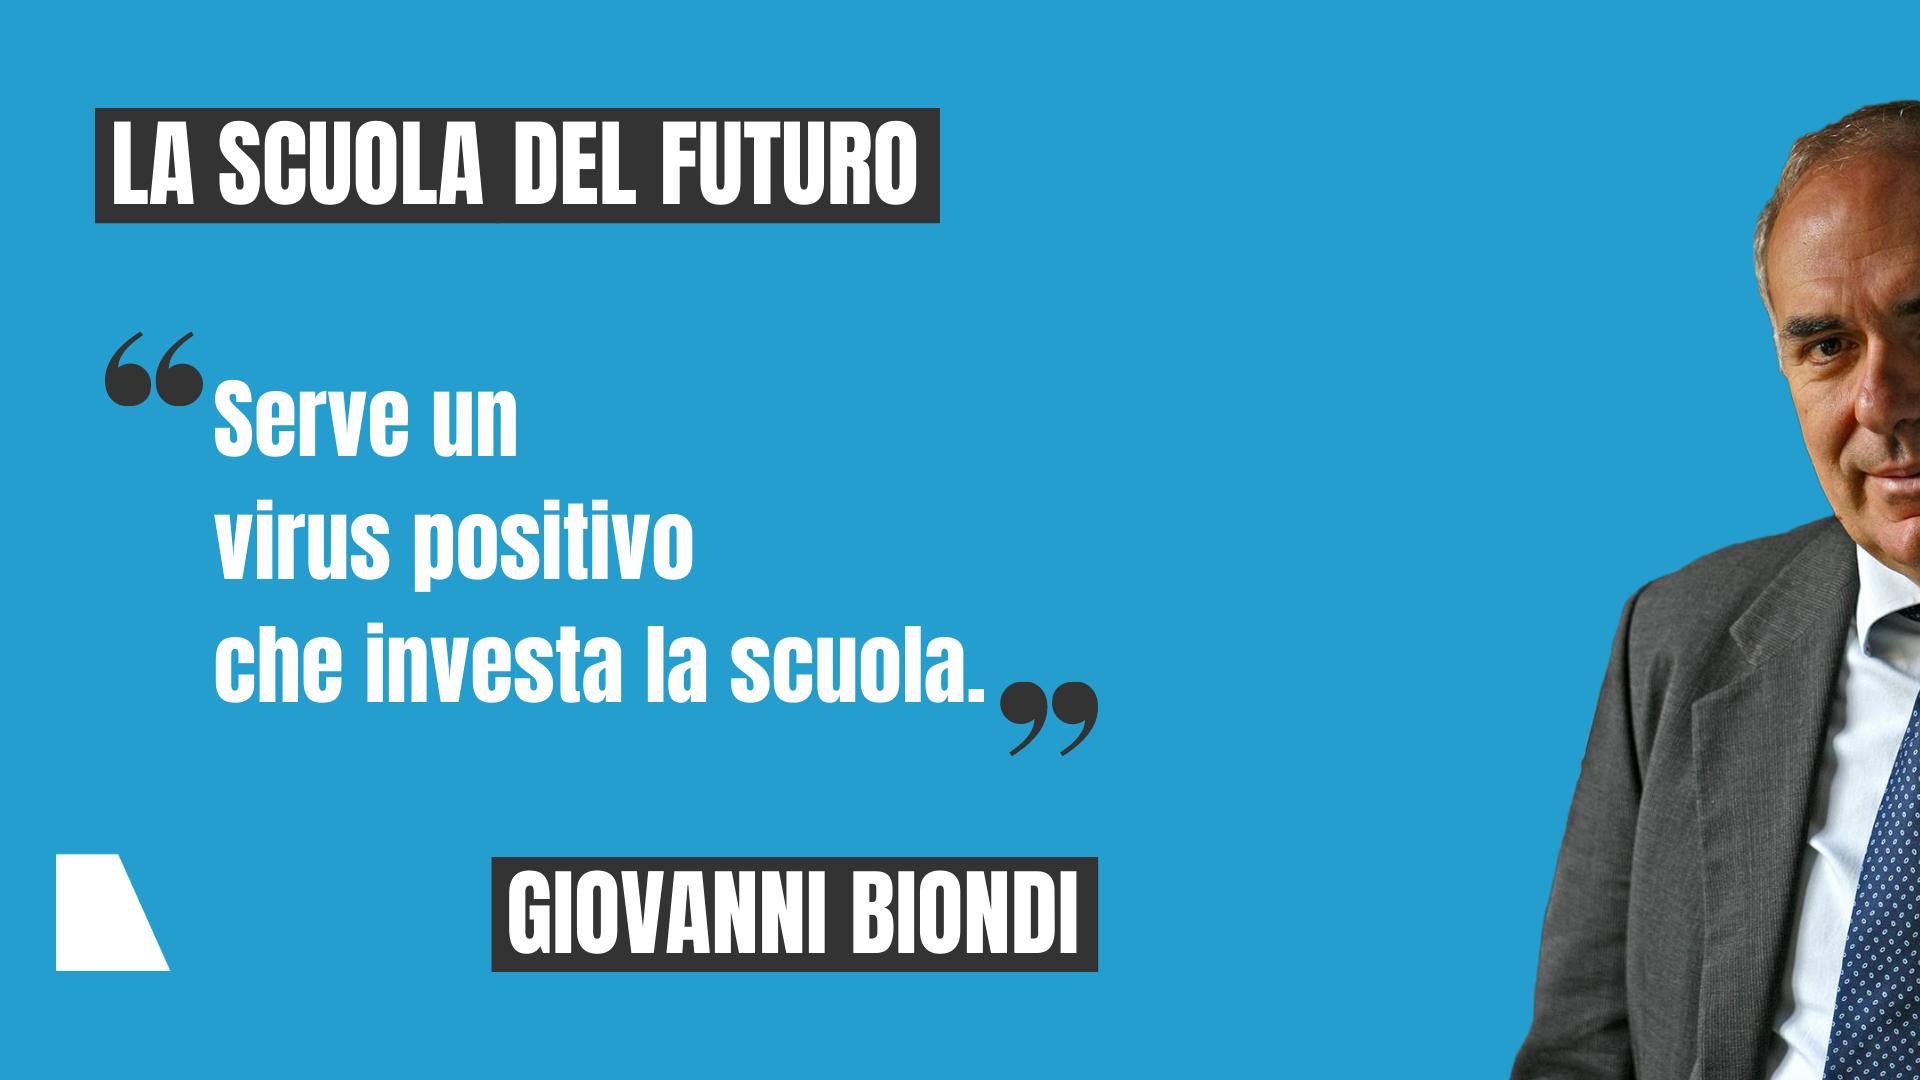 Giovanni Biondi Indire